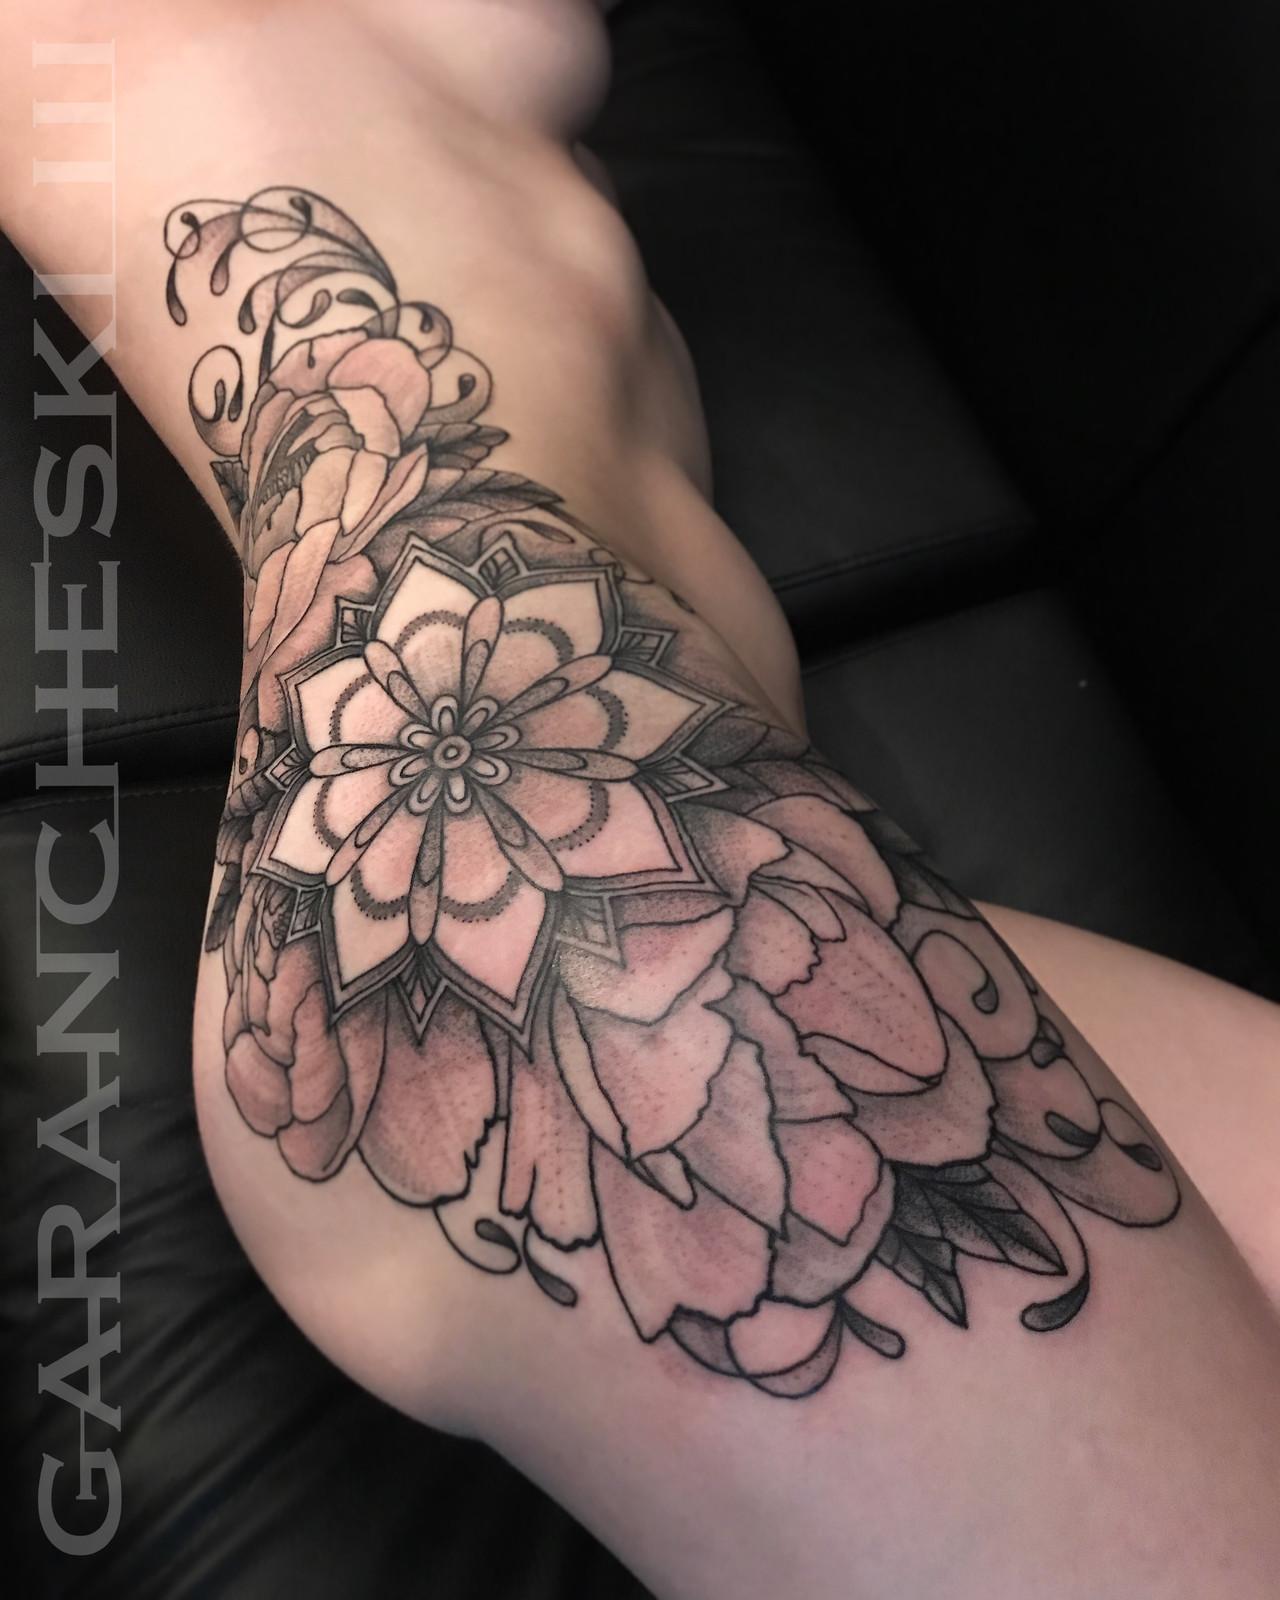 2b92f5032a6f1 Mandala, Peony Flowers, Filigree Tattoo on Side / Hip / Thigh .